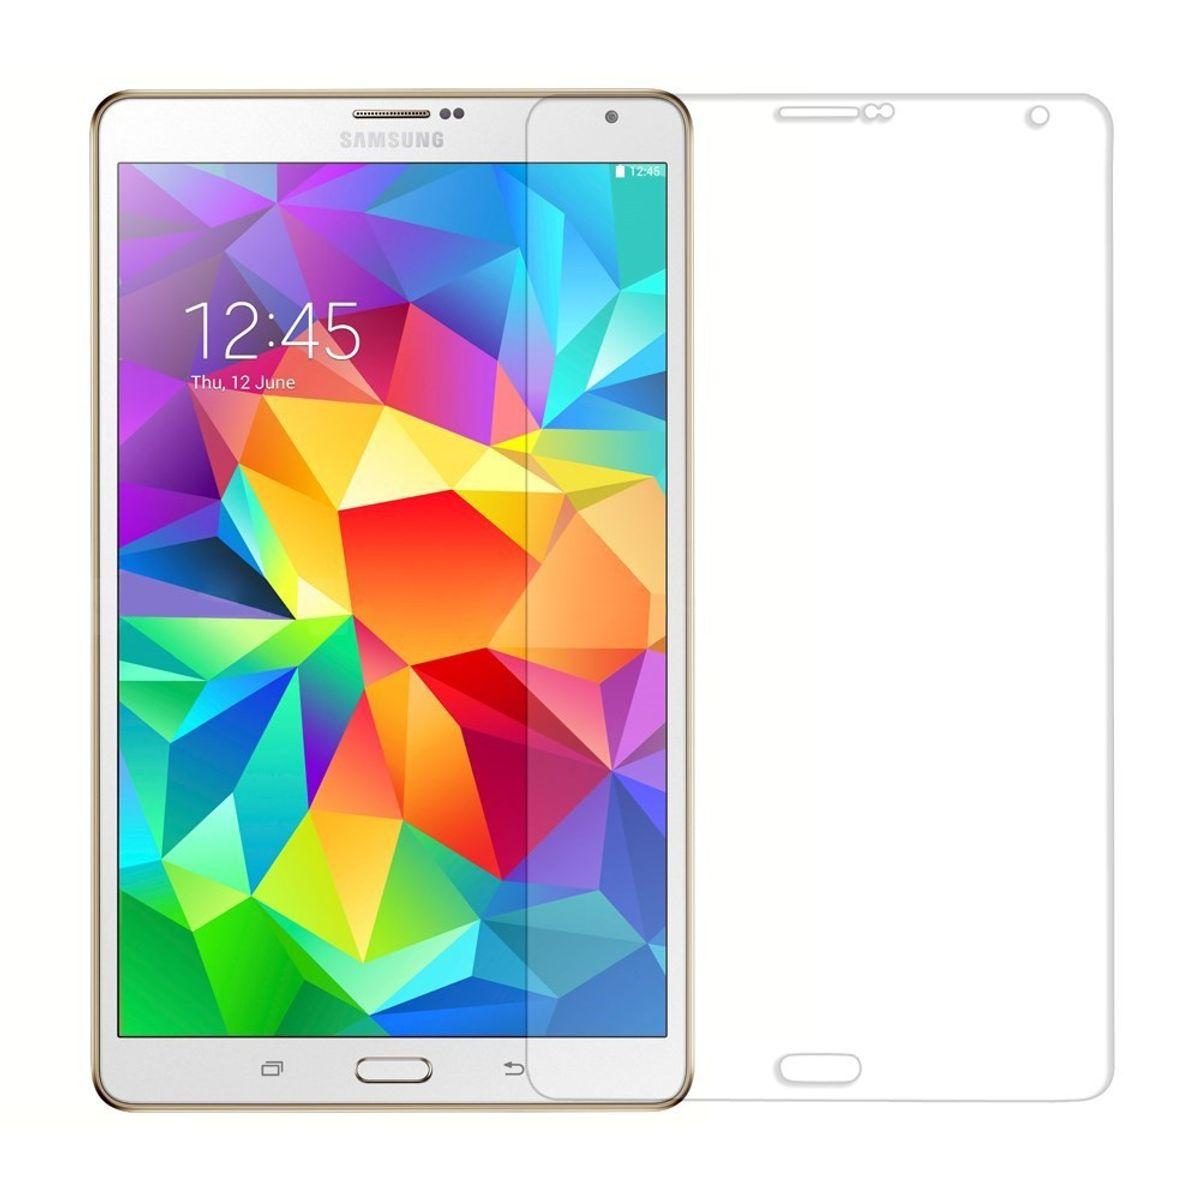 3X Supershieldz Clear Screen Protector Shield for Samsung Galaxy Tab S 8.4